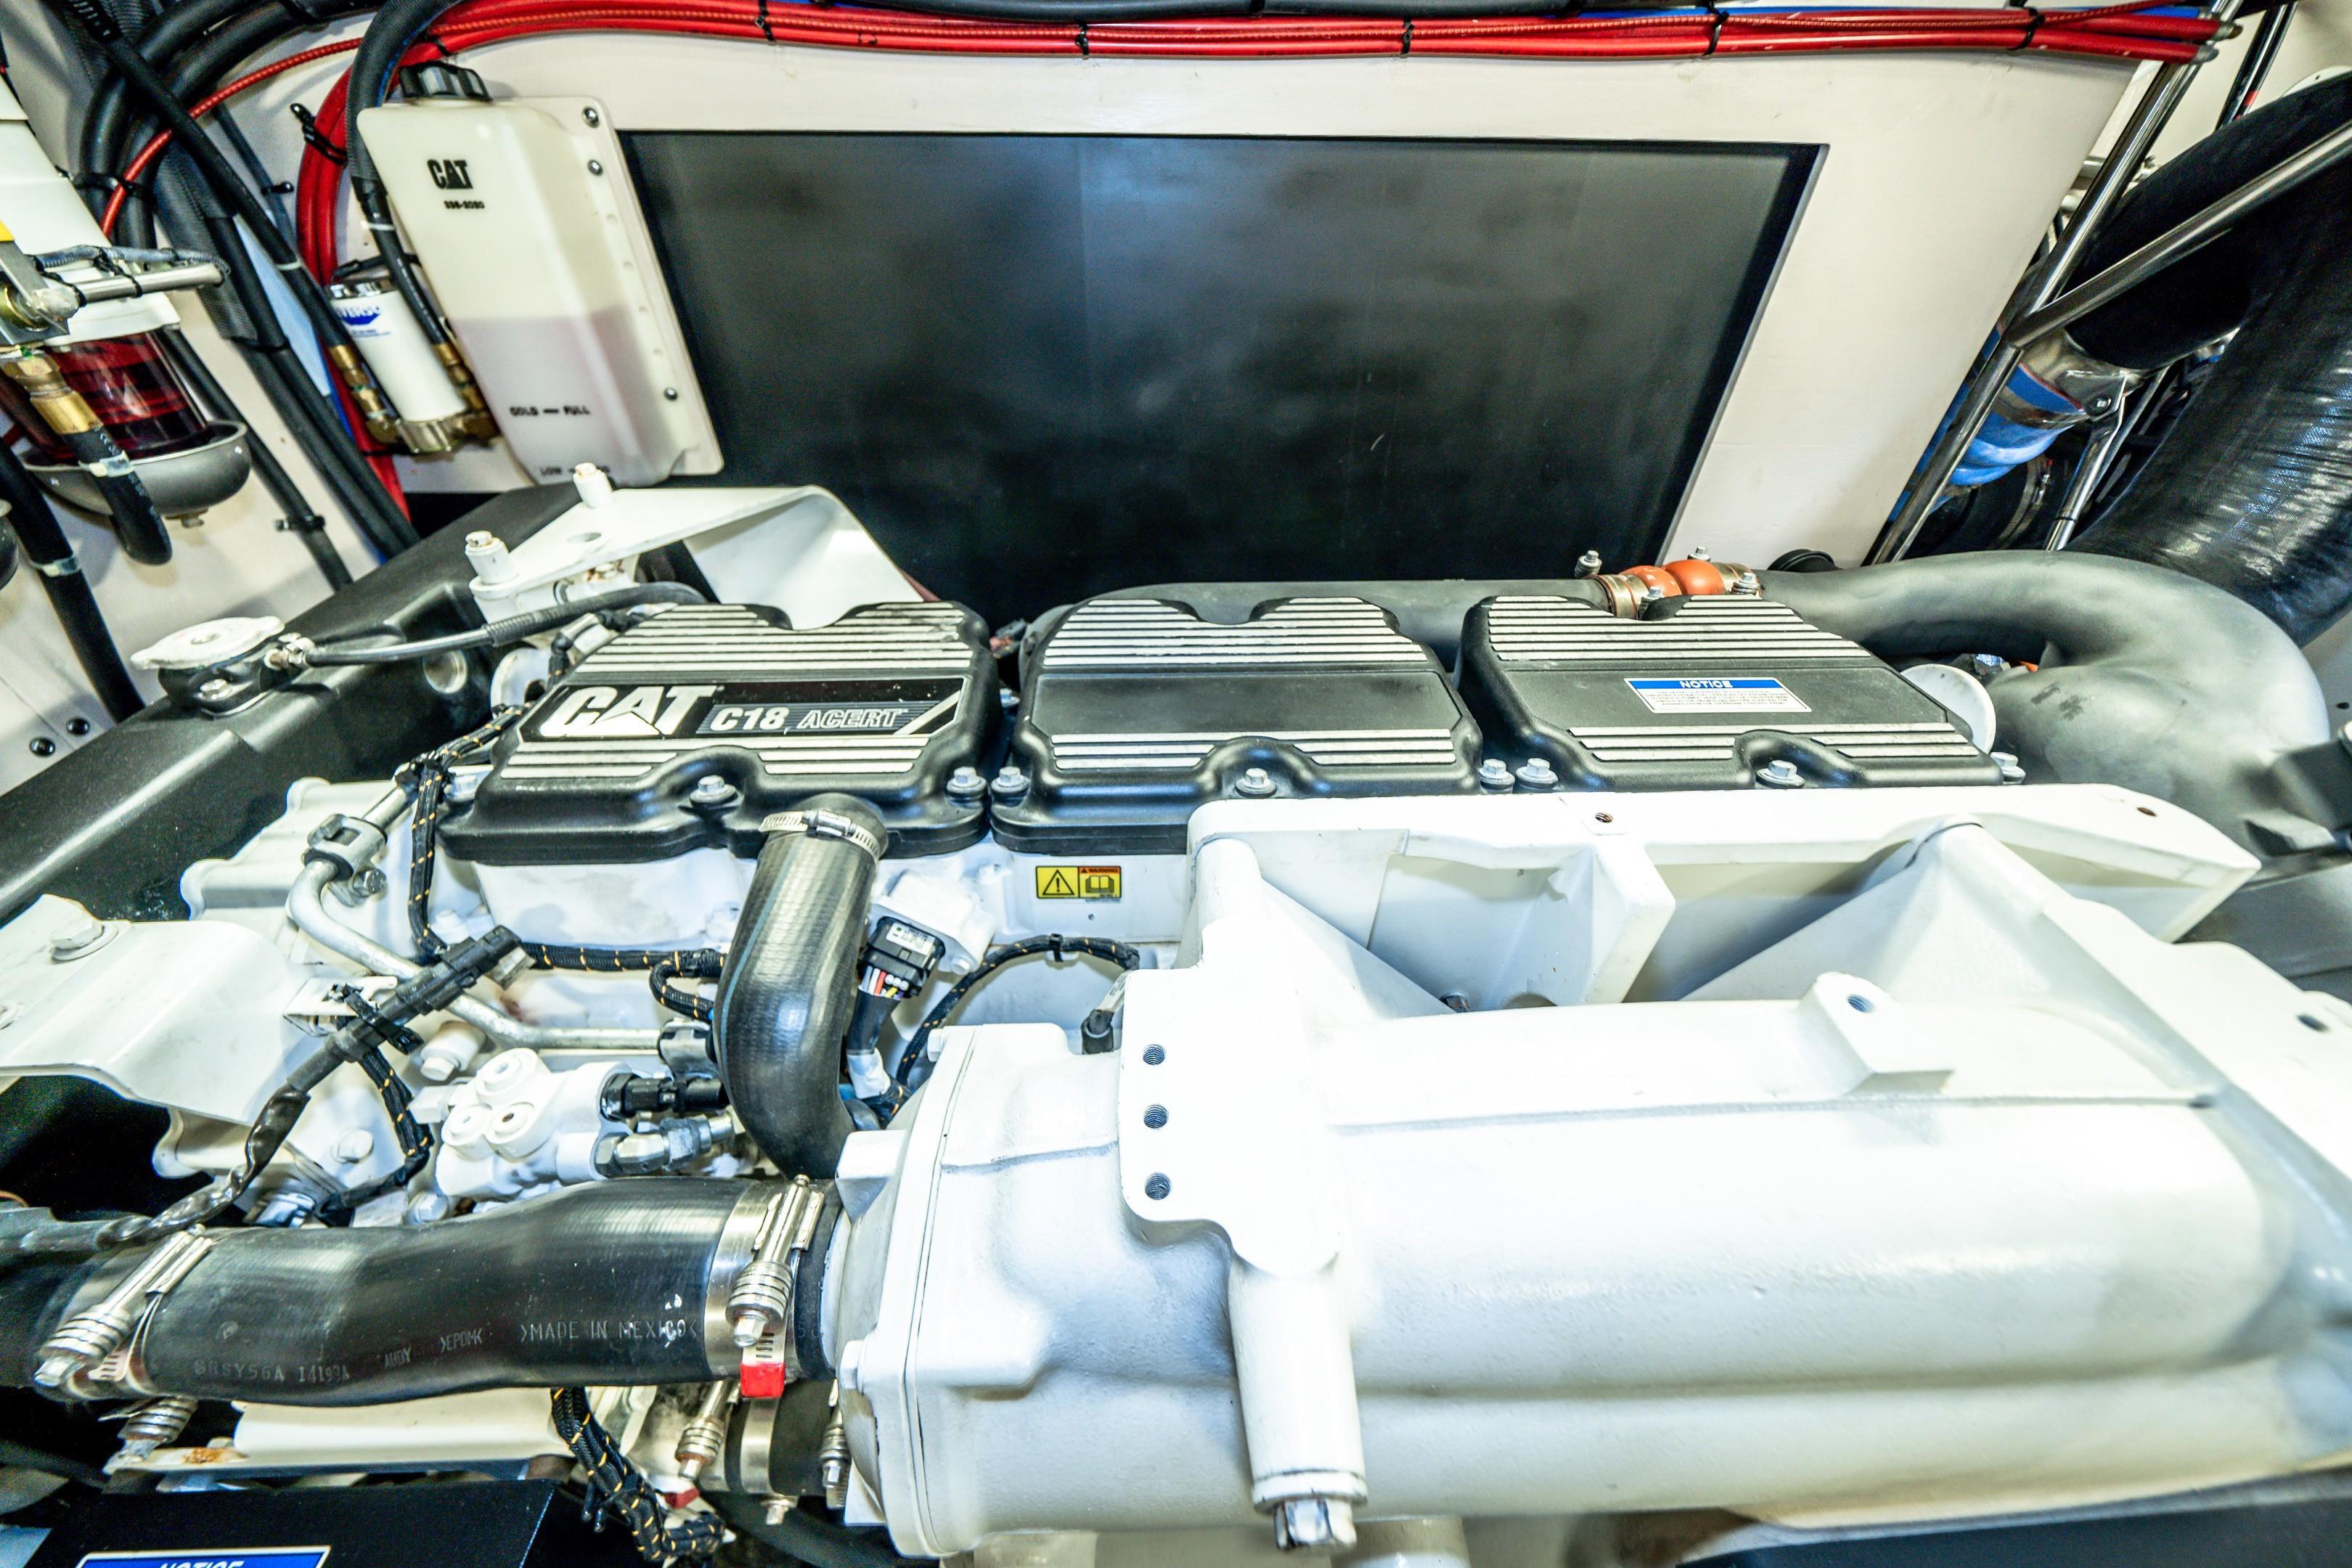 2015 Sea Ray 65' Motor Yacht | HMY Yacht Sales